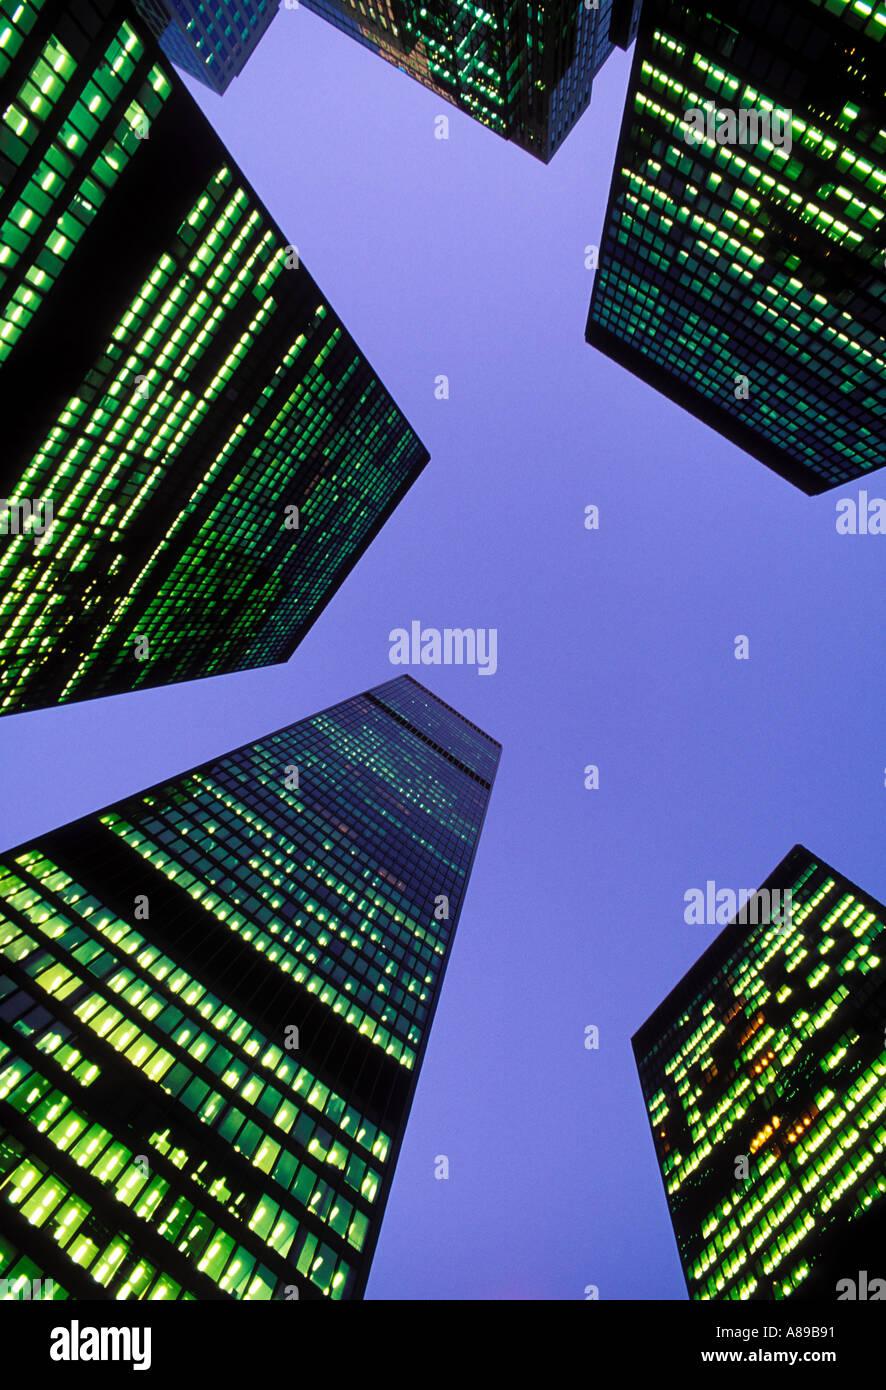 Canada Ontario Toronto Office towers illuminated at night - Stock Image